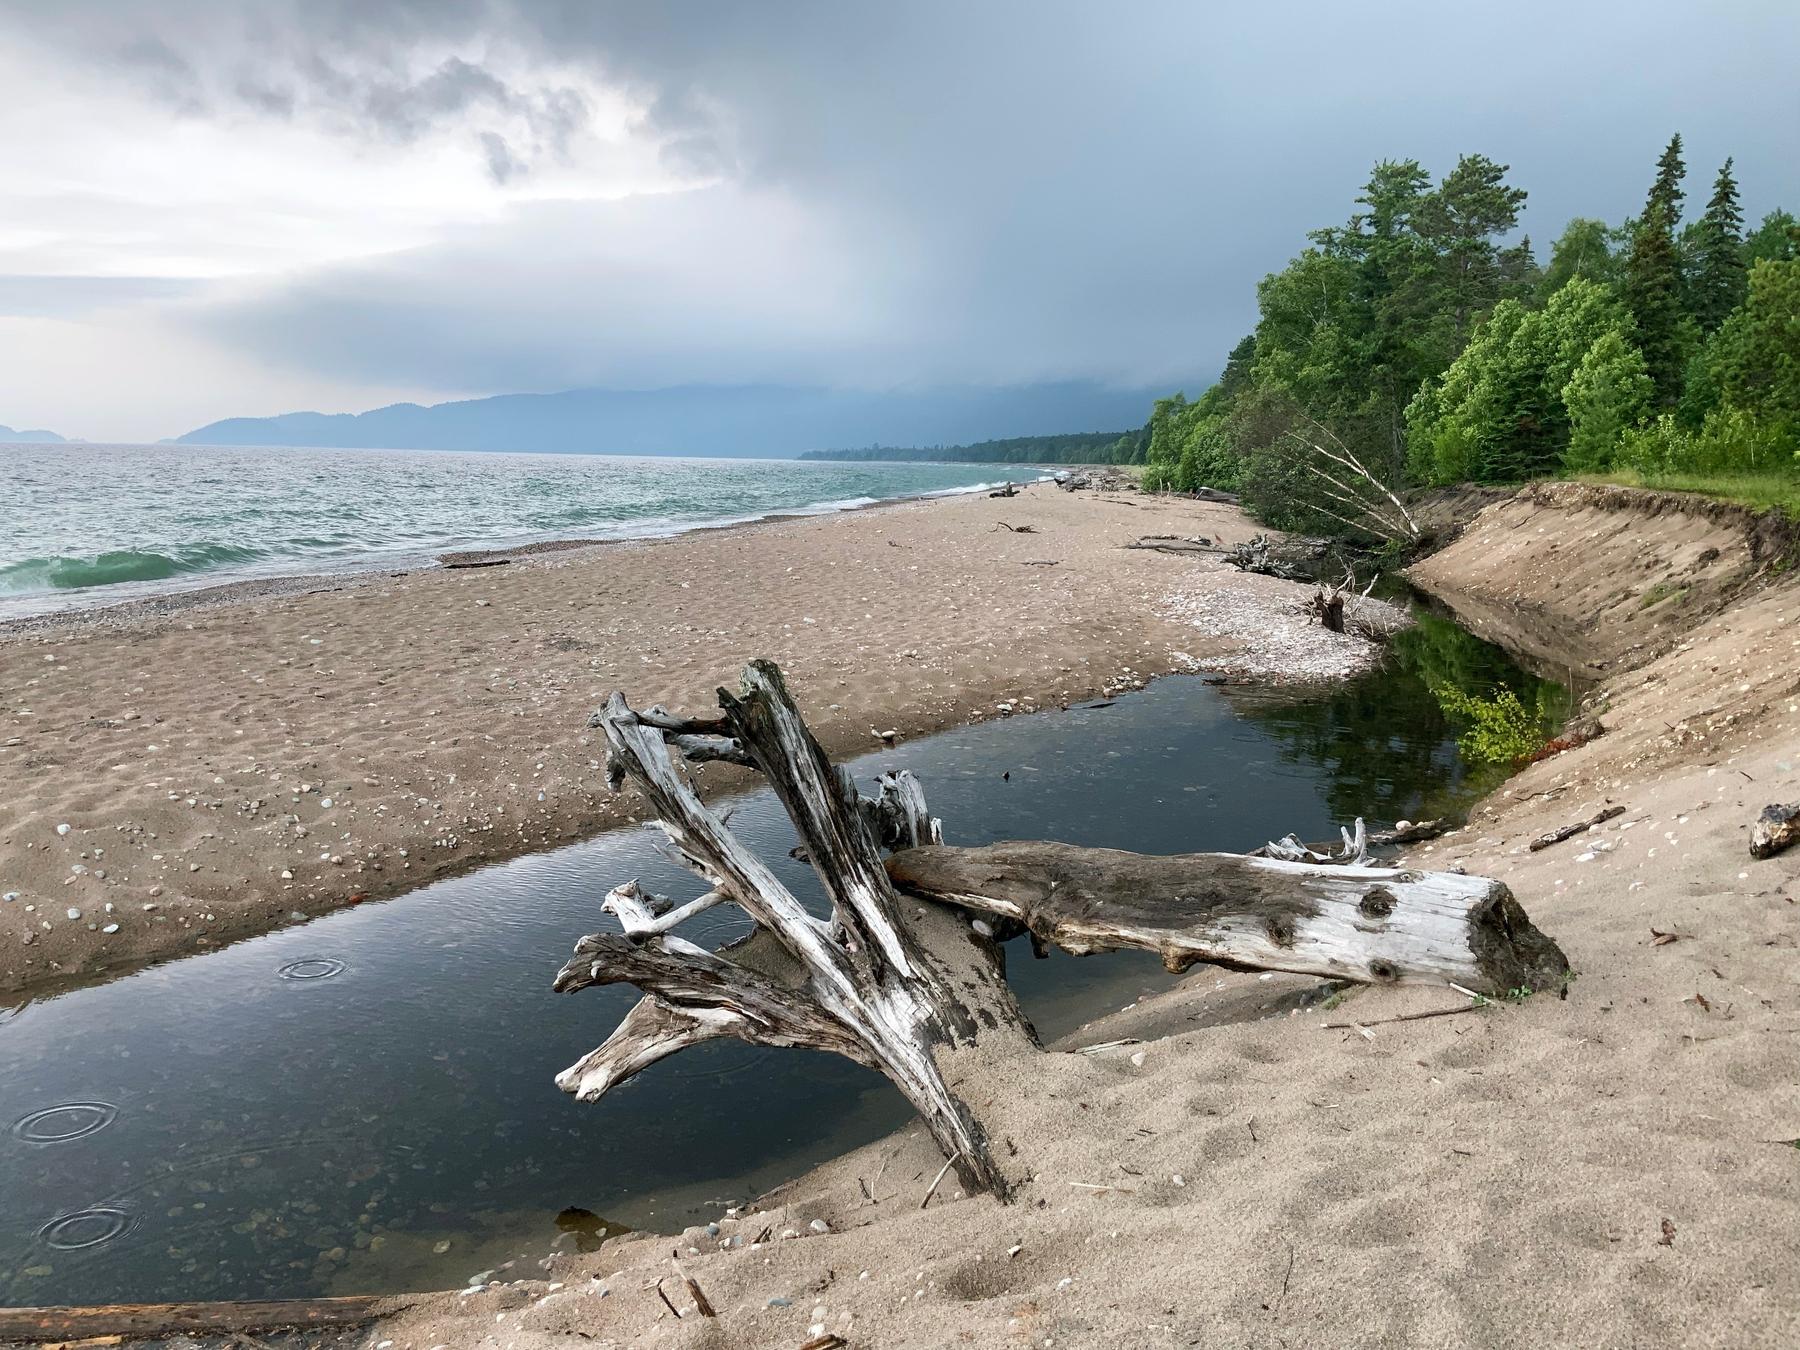 the shoreline of Lake Superior in Canada, Agawa Bay